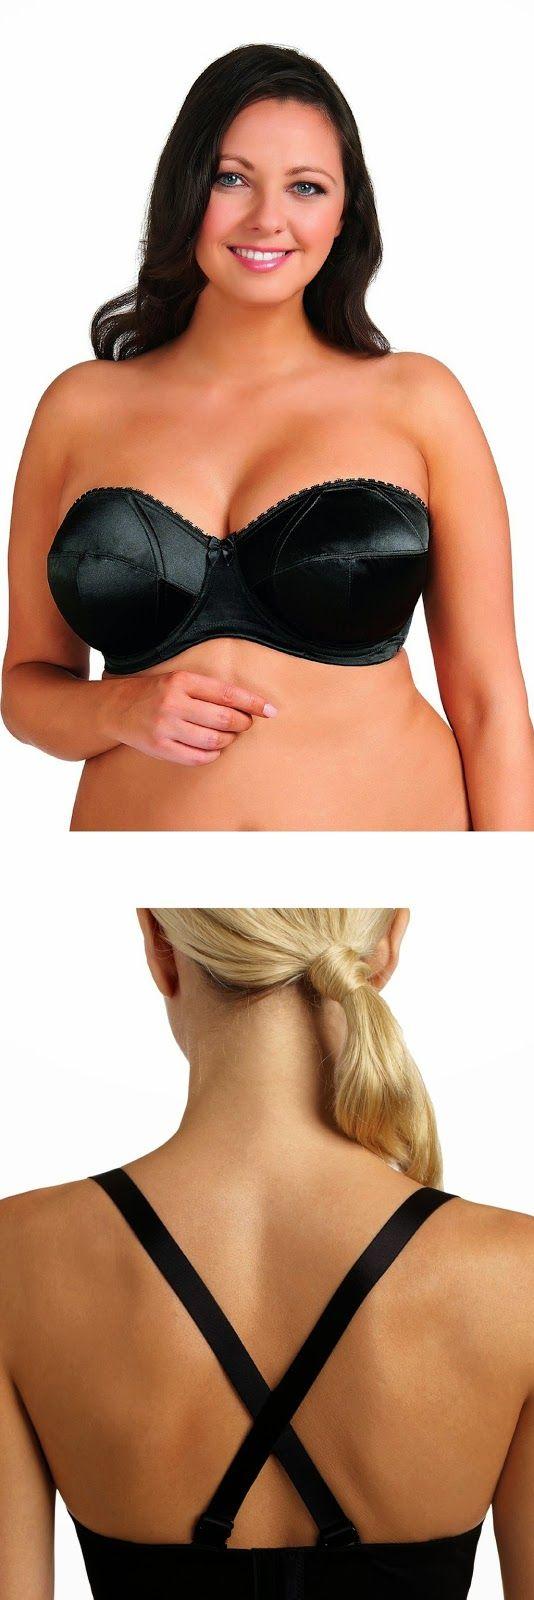 12 best plus size strapless bras images on Pinterest ...